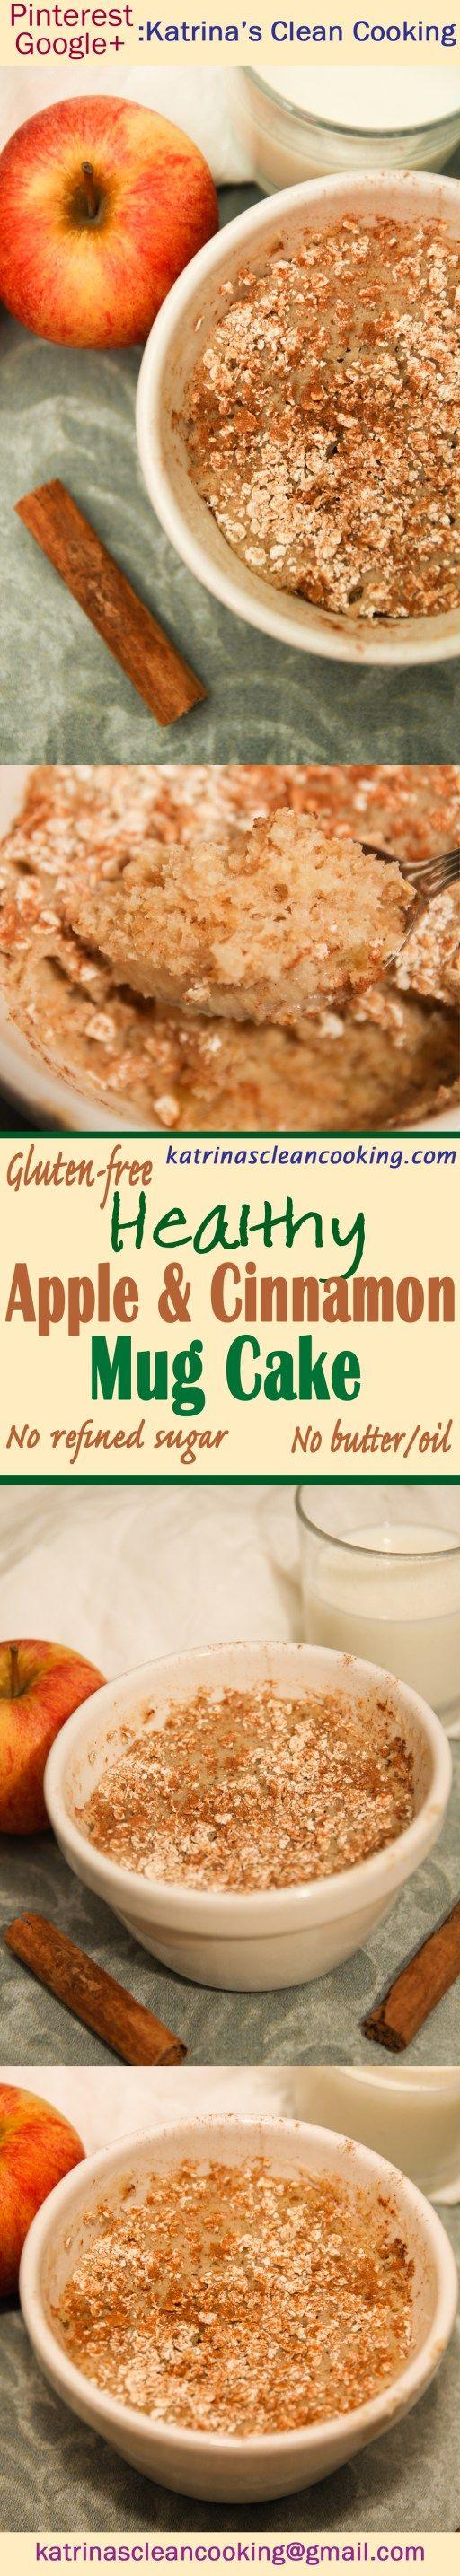 Healthy Apple Cinnamon Oat Mug Cake #healthy #mugcake #vegan #glutenfree